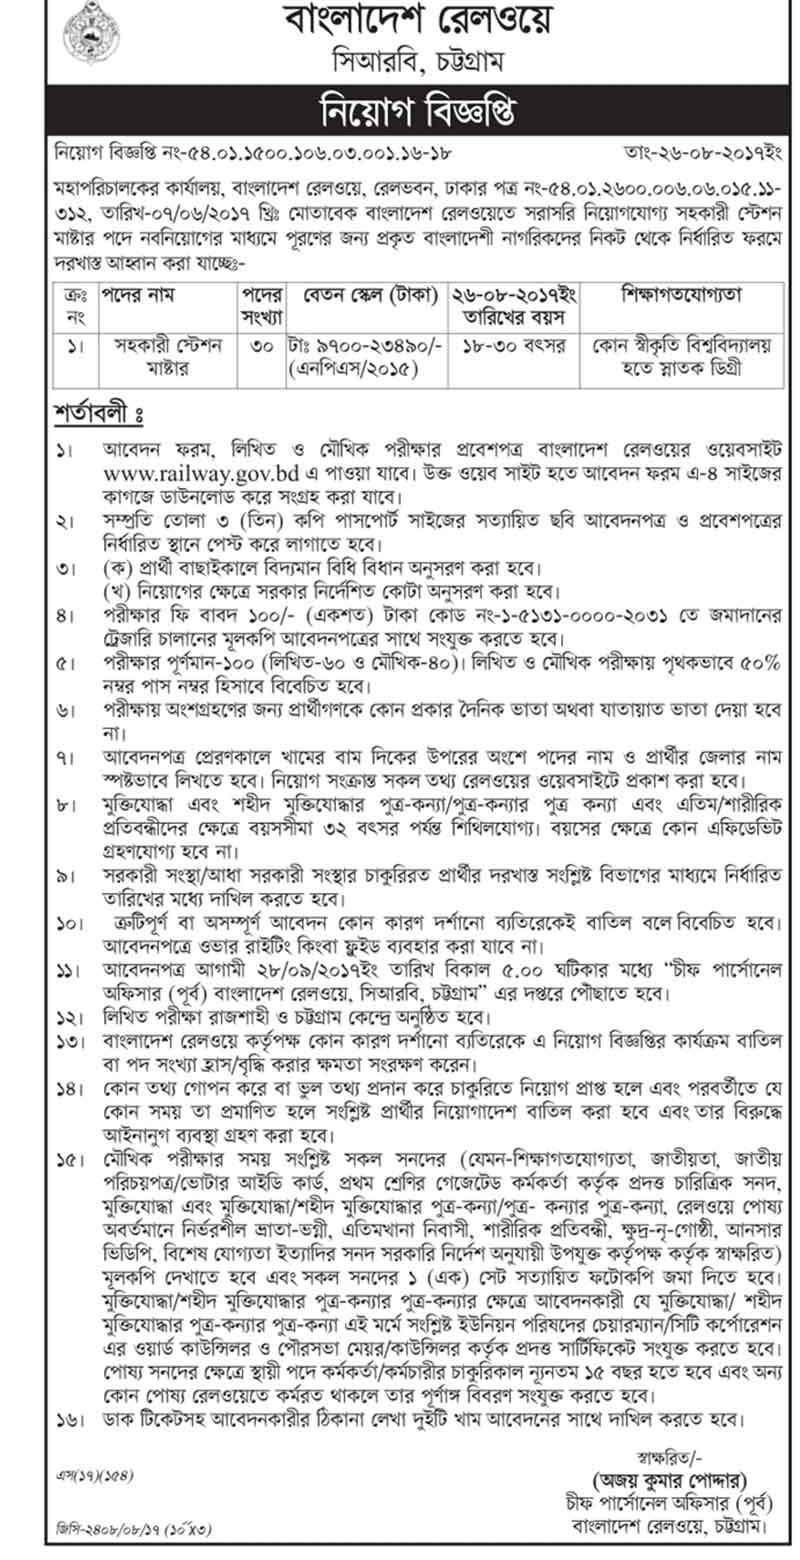 Bangladesh railway jobs circular 2017 bdjobstotal m bangladesh railway circular for jobs seeker is a government job circular in chittagong job application form admit card written exam result info falaconquin